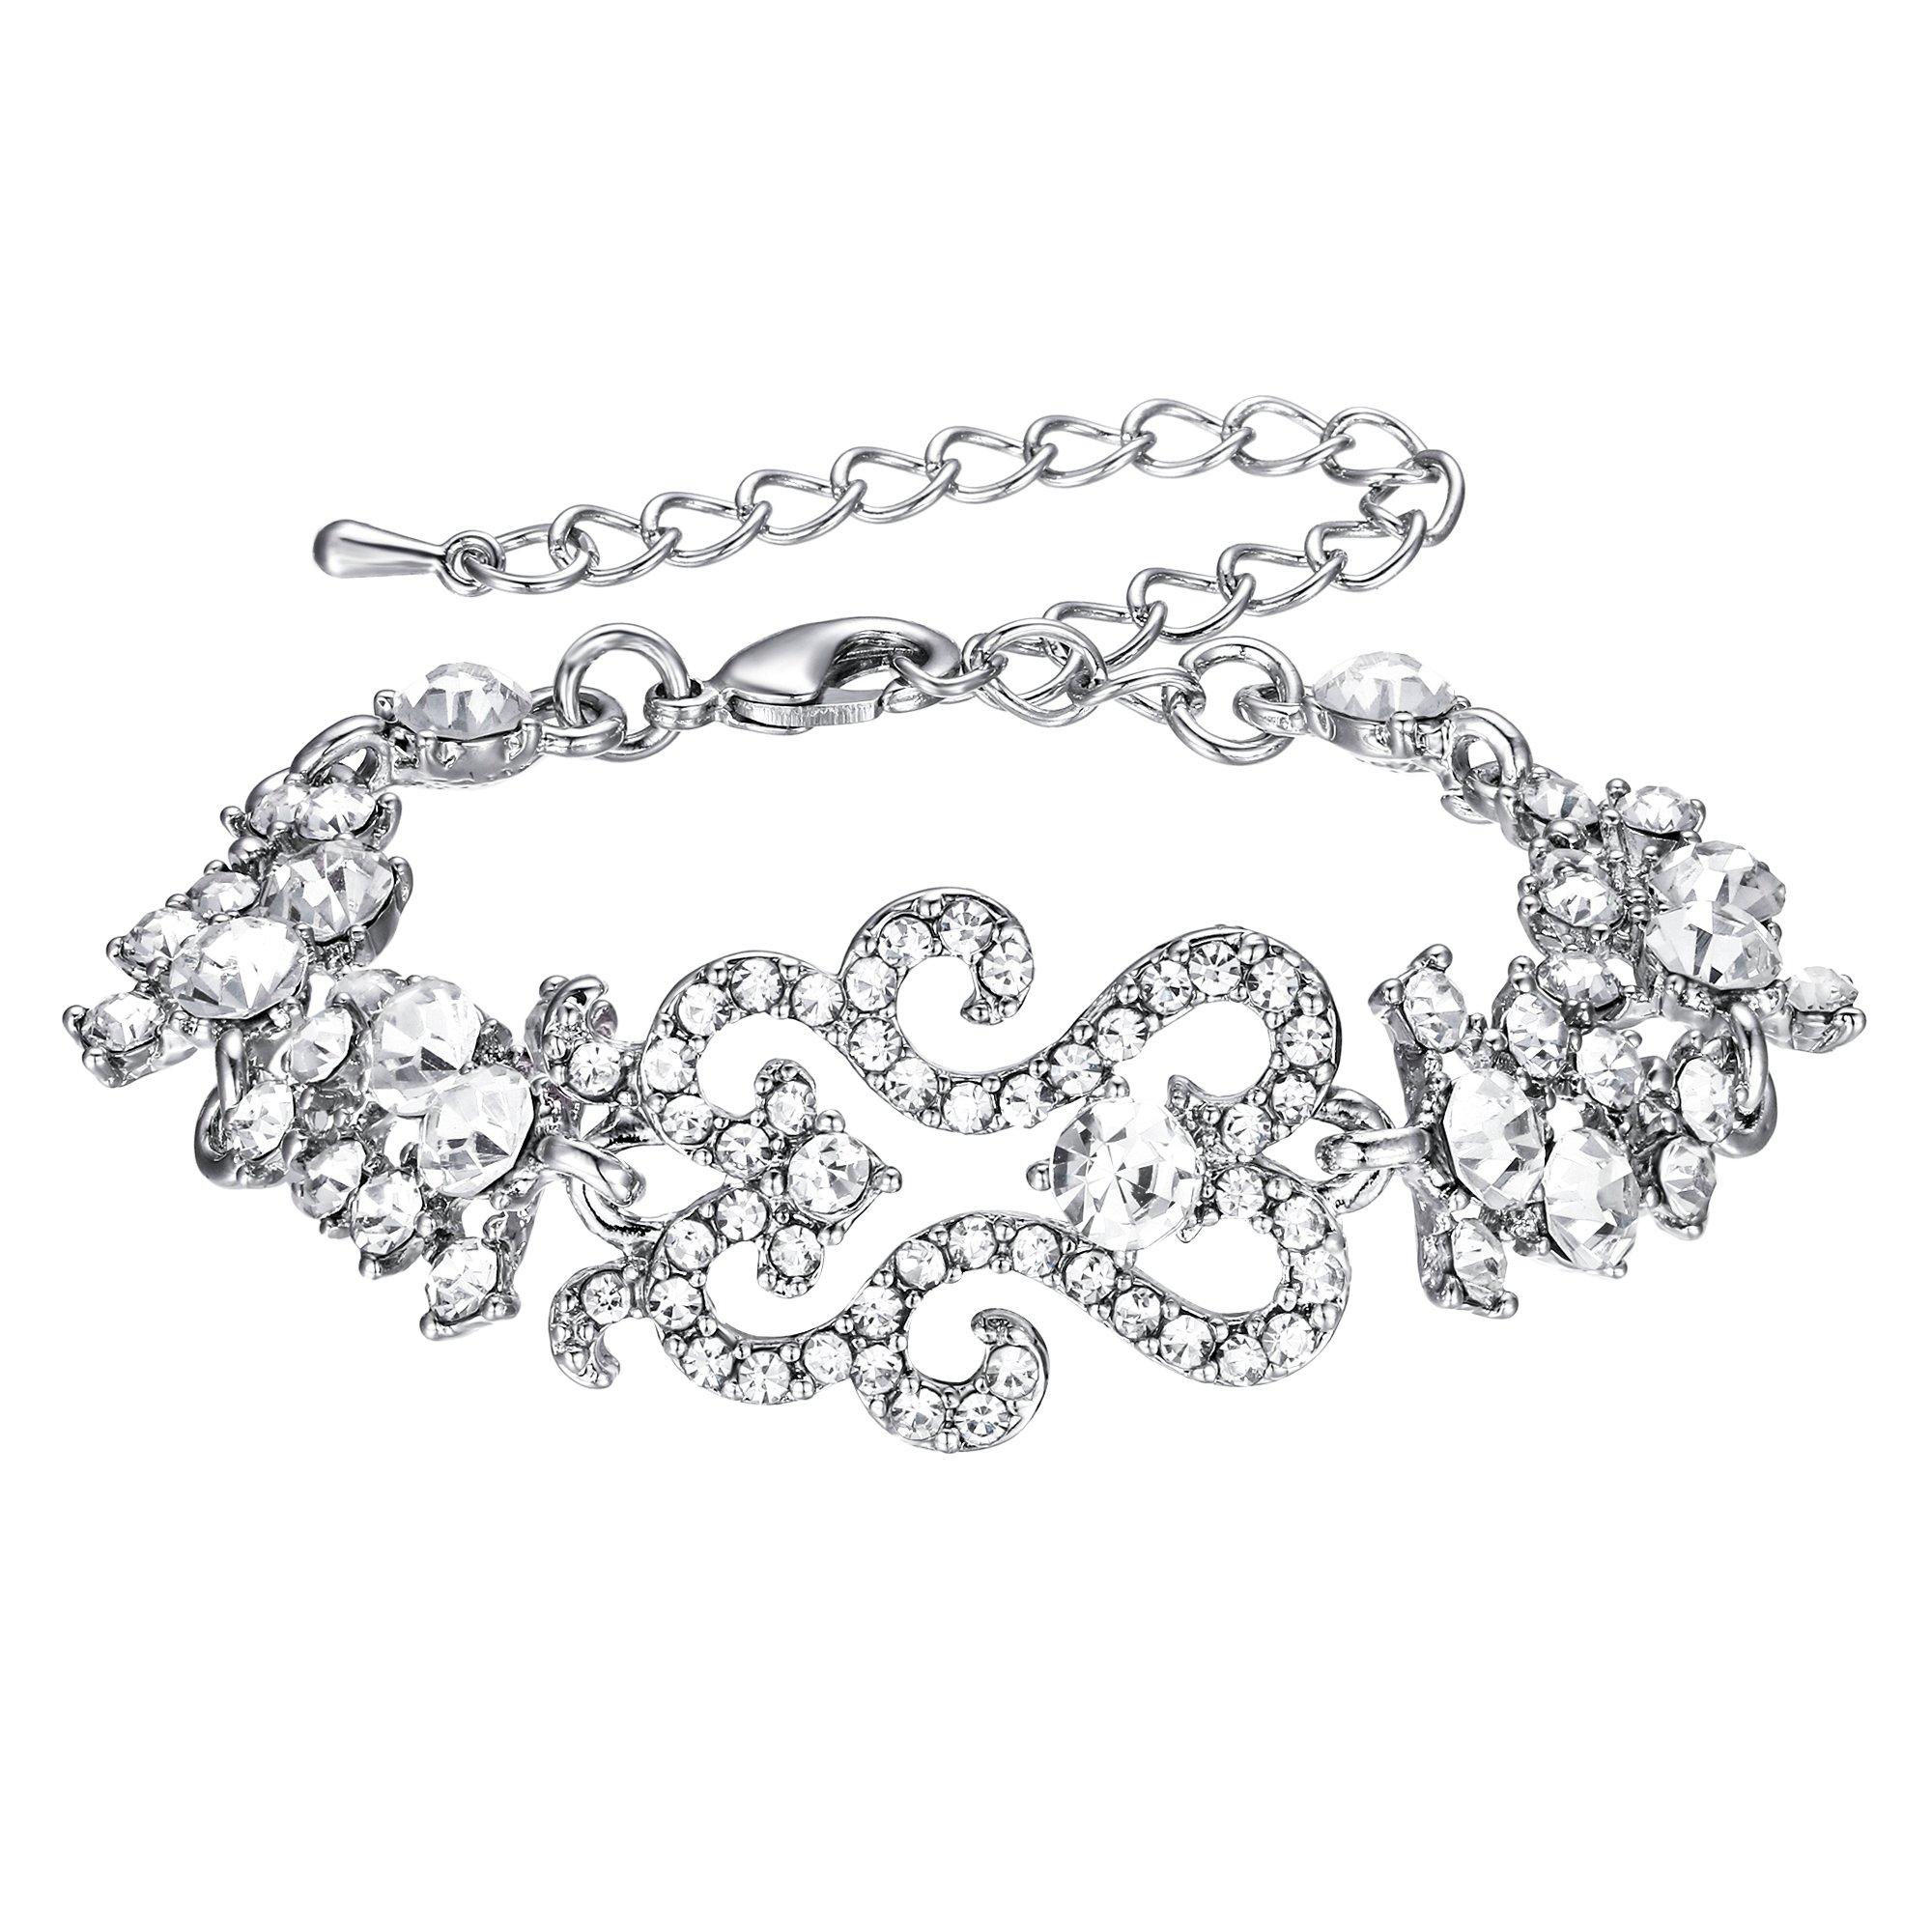 EVER FAITH Women's Crystal Bridal Flower Cluster Wave Adjustable Link Bracelet Clear Silver-Tone